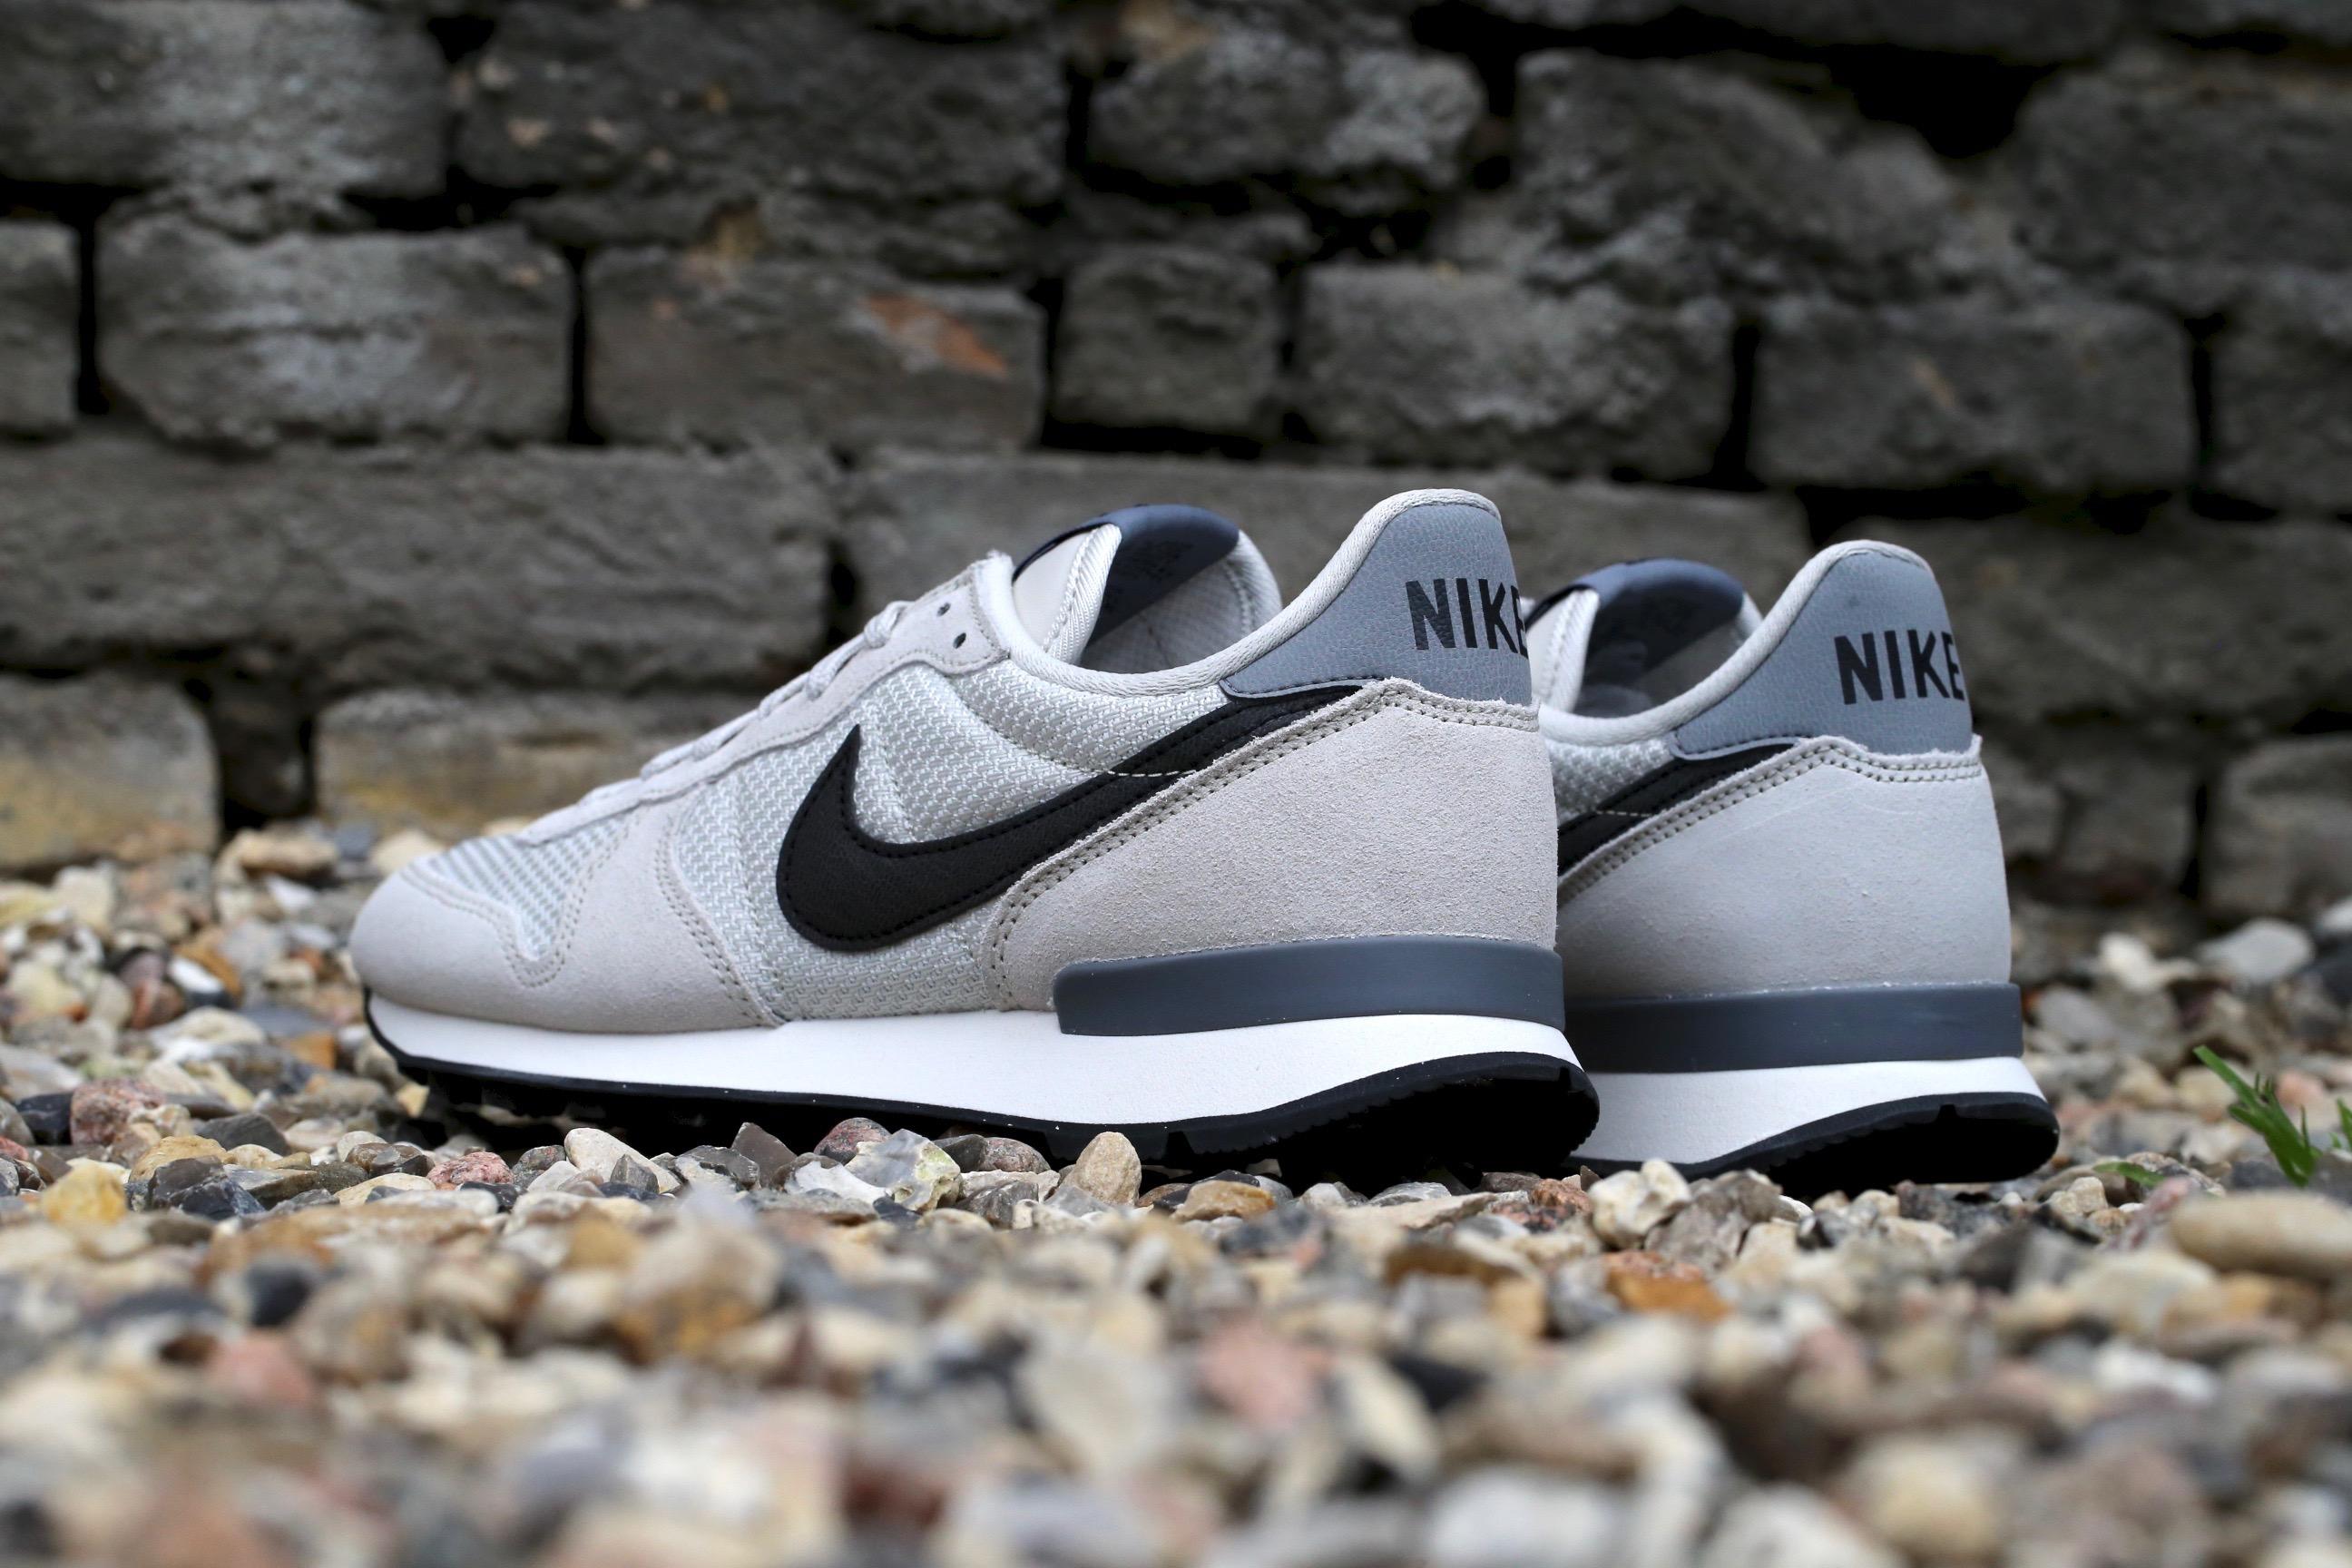 Nike Internationalist Light Bone / Cool Grey / Sail / Black